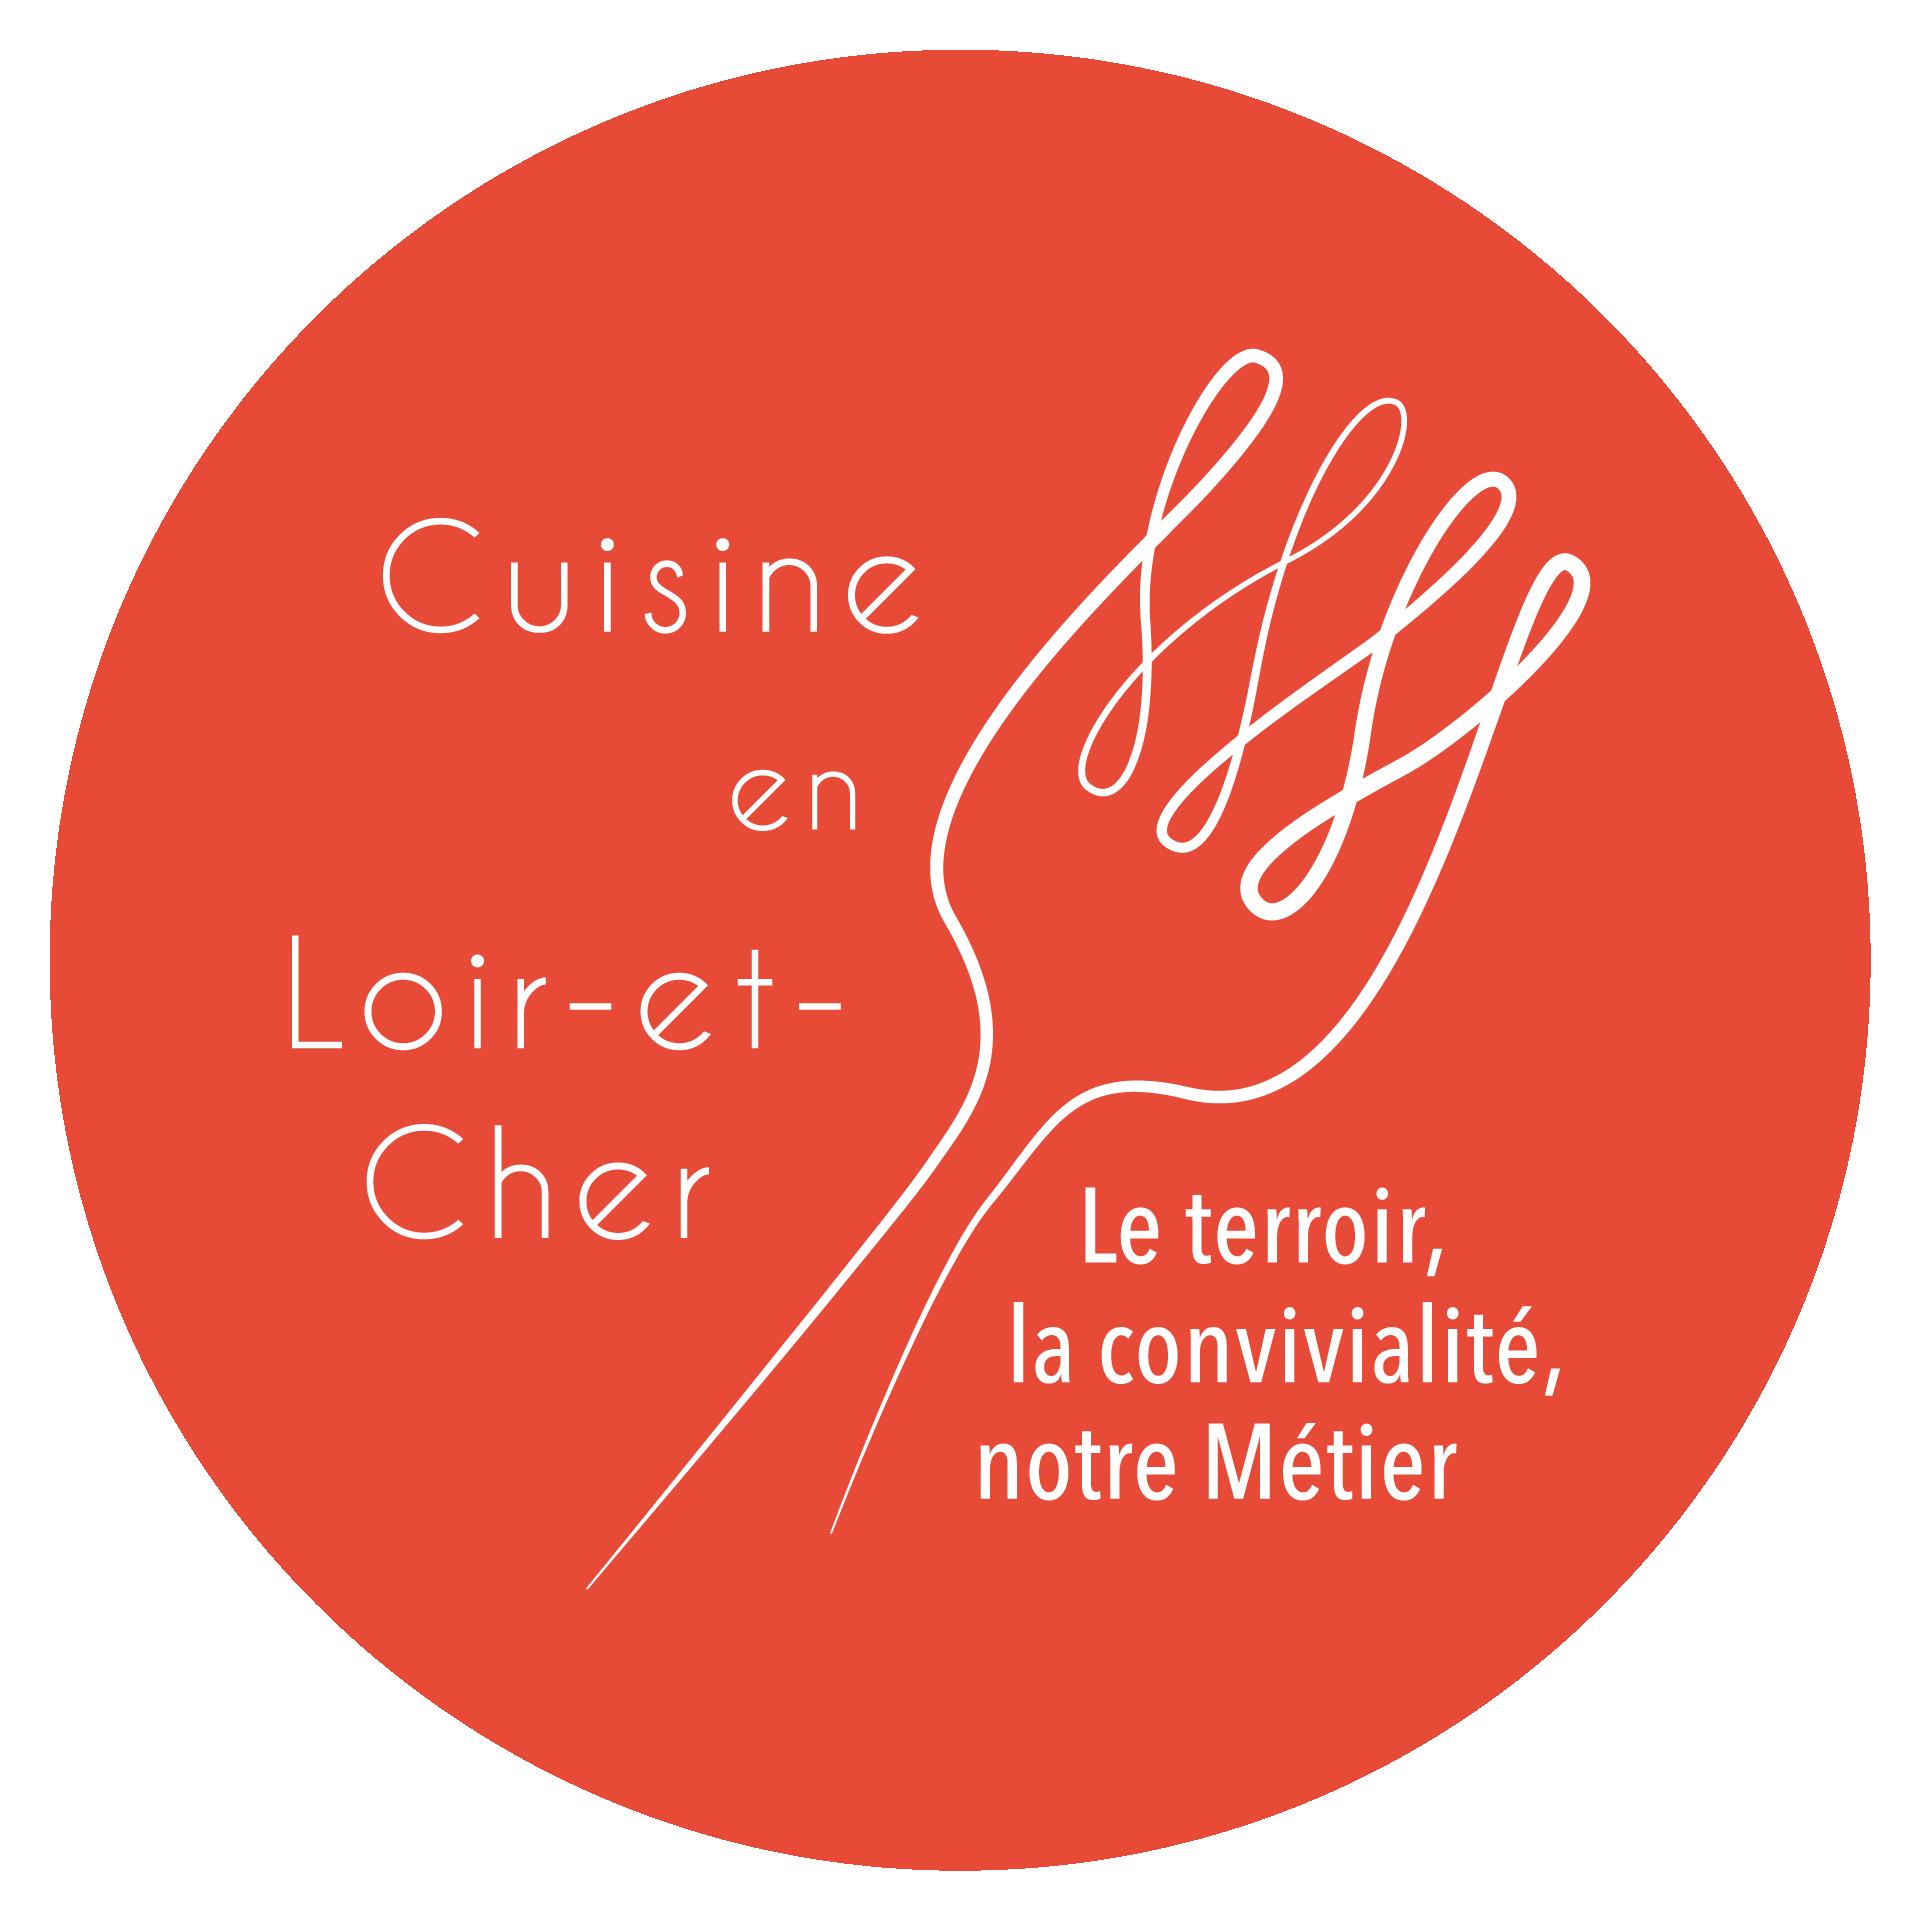 cuisine-en-loir-et-cher